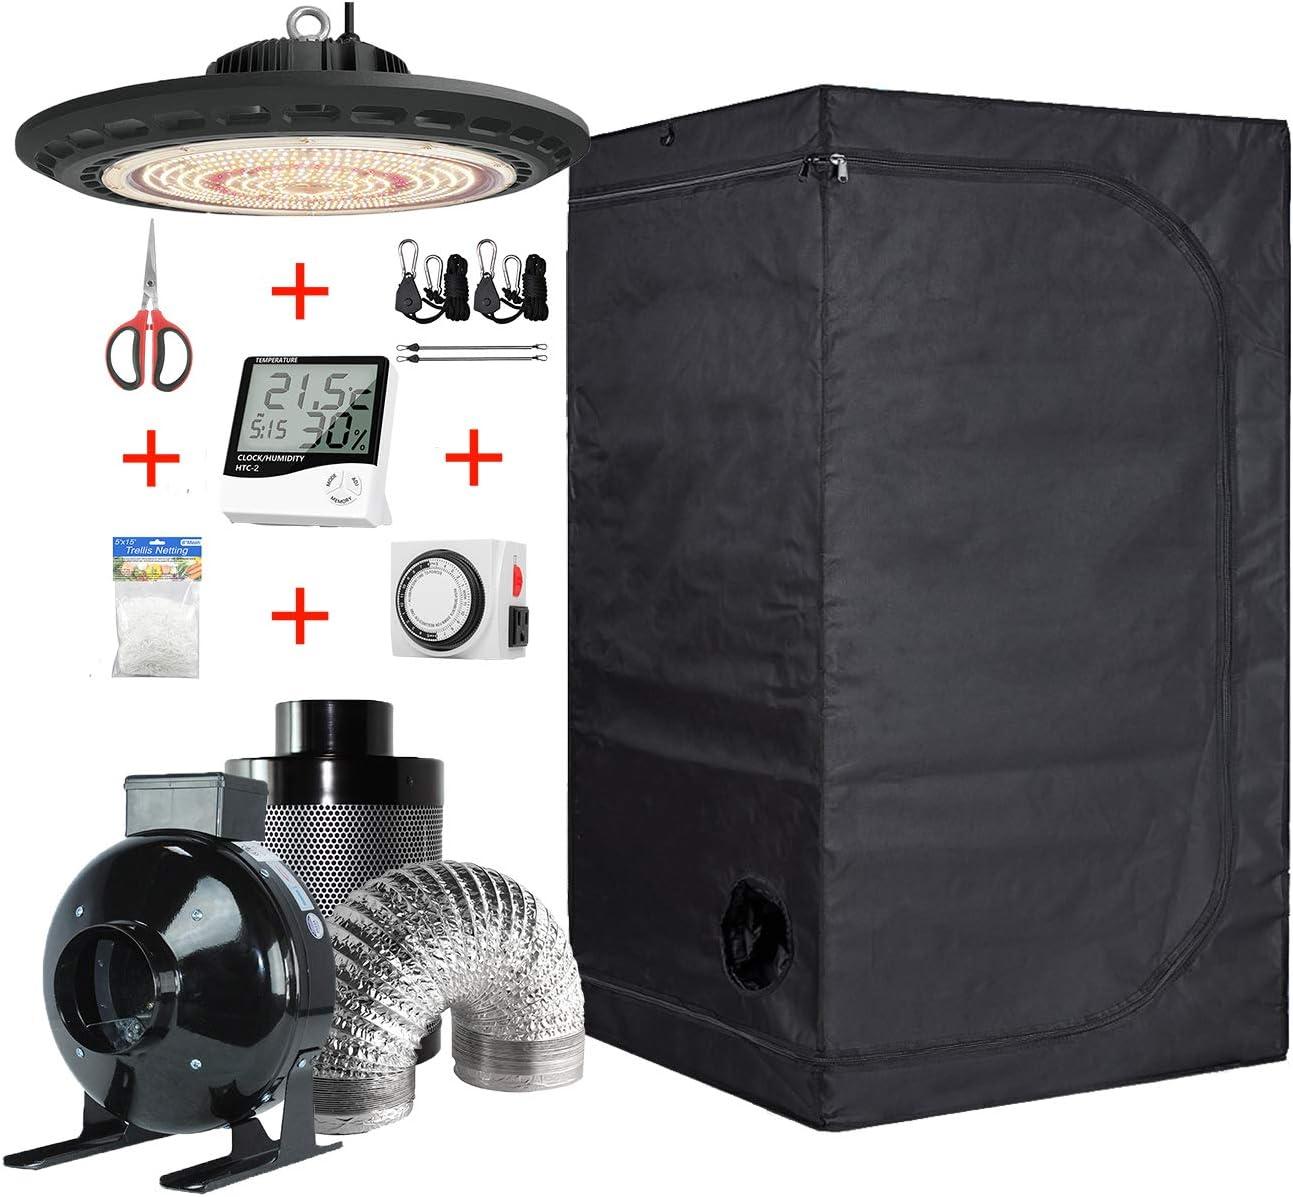 Hydro Max 78% OFF Plus Growing Tent Kit 3X3 Grow LED 200W Room UFO Sacramento Mall Gro +